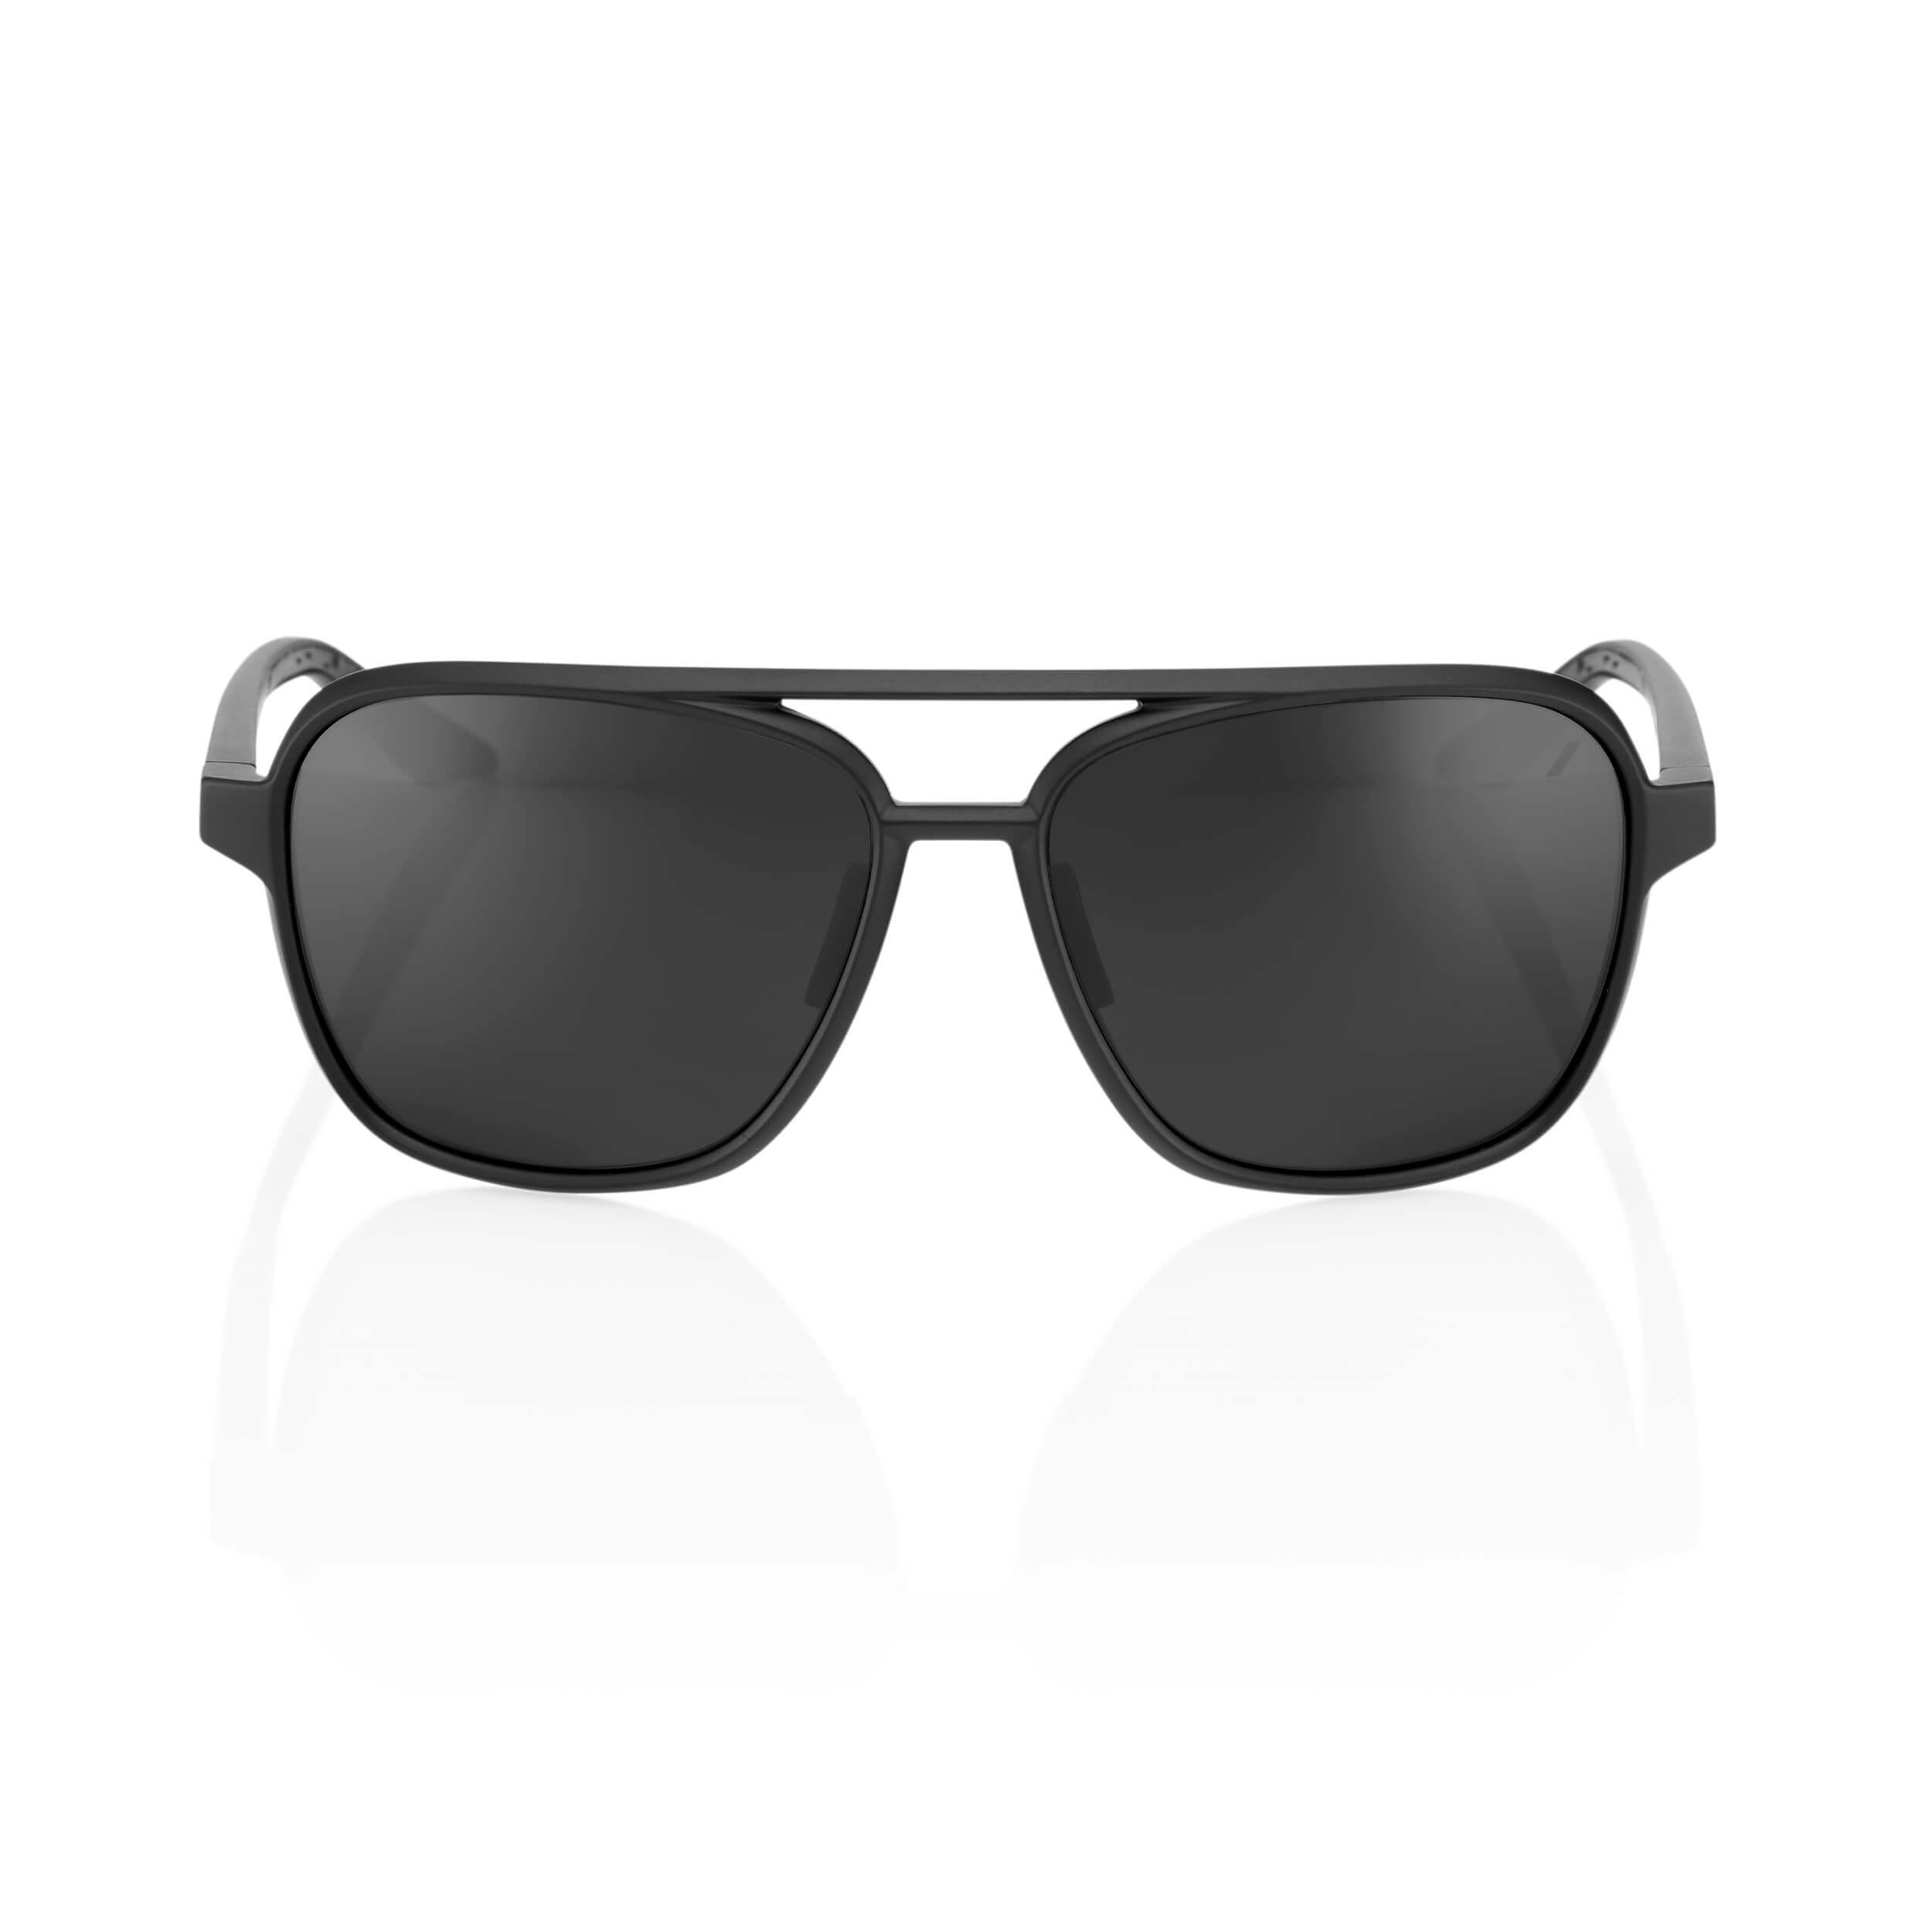 KASIA Aviator Round – Matte Black – Black Mirror Lens